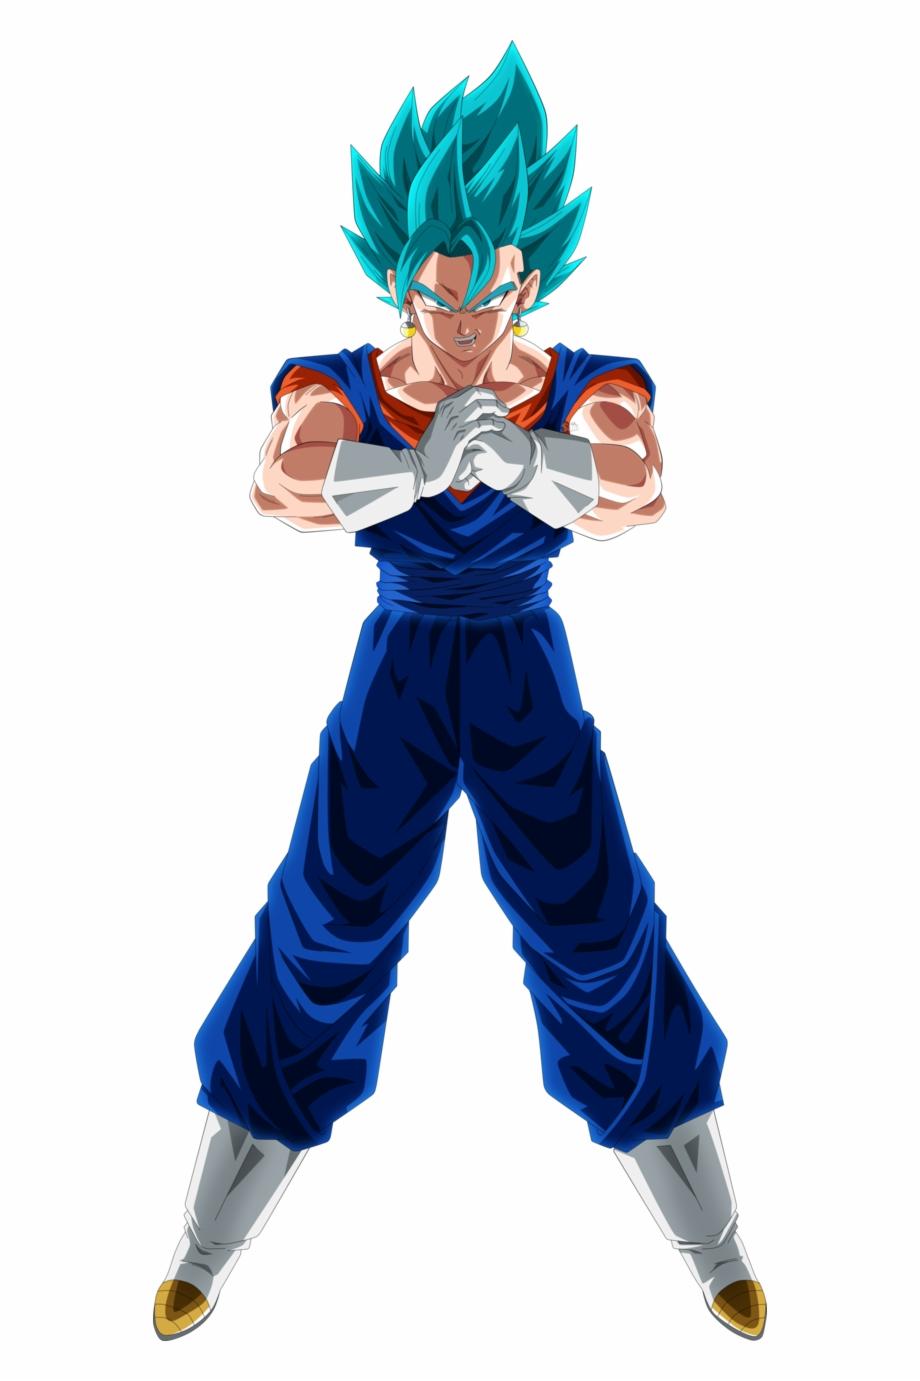 Super Saiyan Blue Aura Png Download Vegito Image Vegetto Ssj Blue Anime Dragon Ball Super Vegito Ssj Blue Super Saiyan Blue